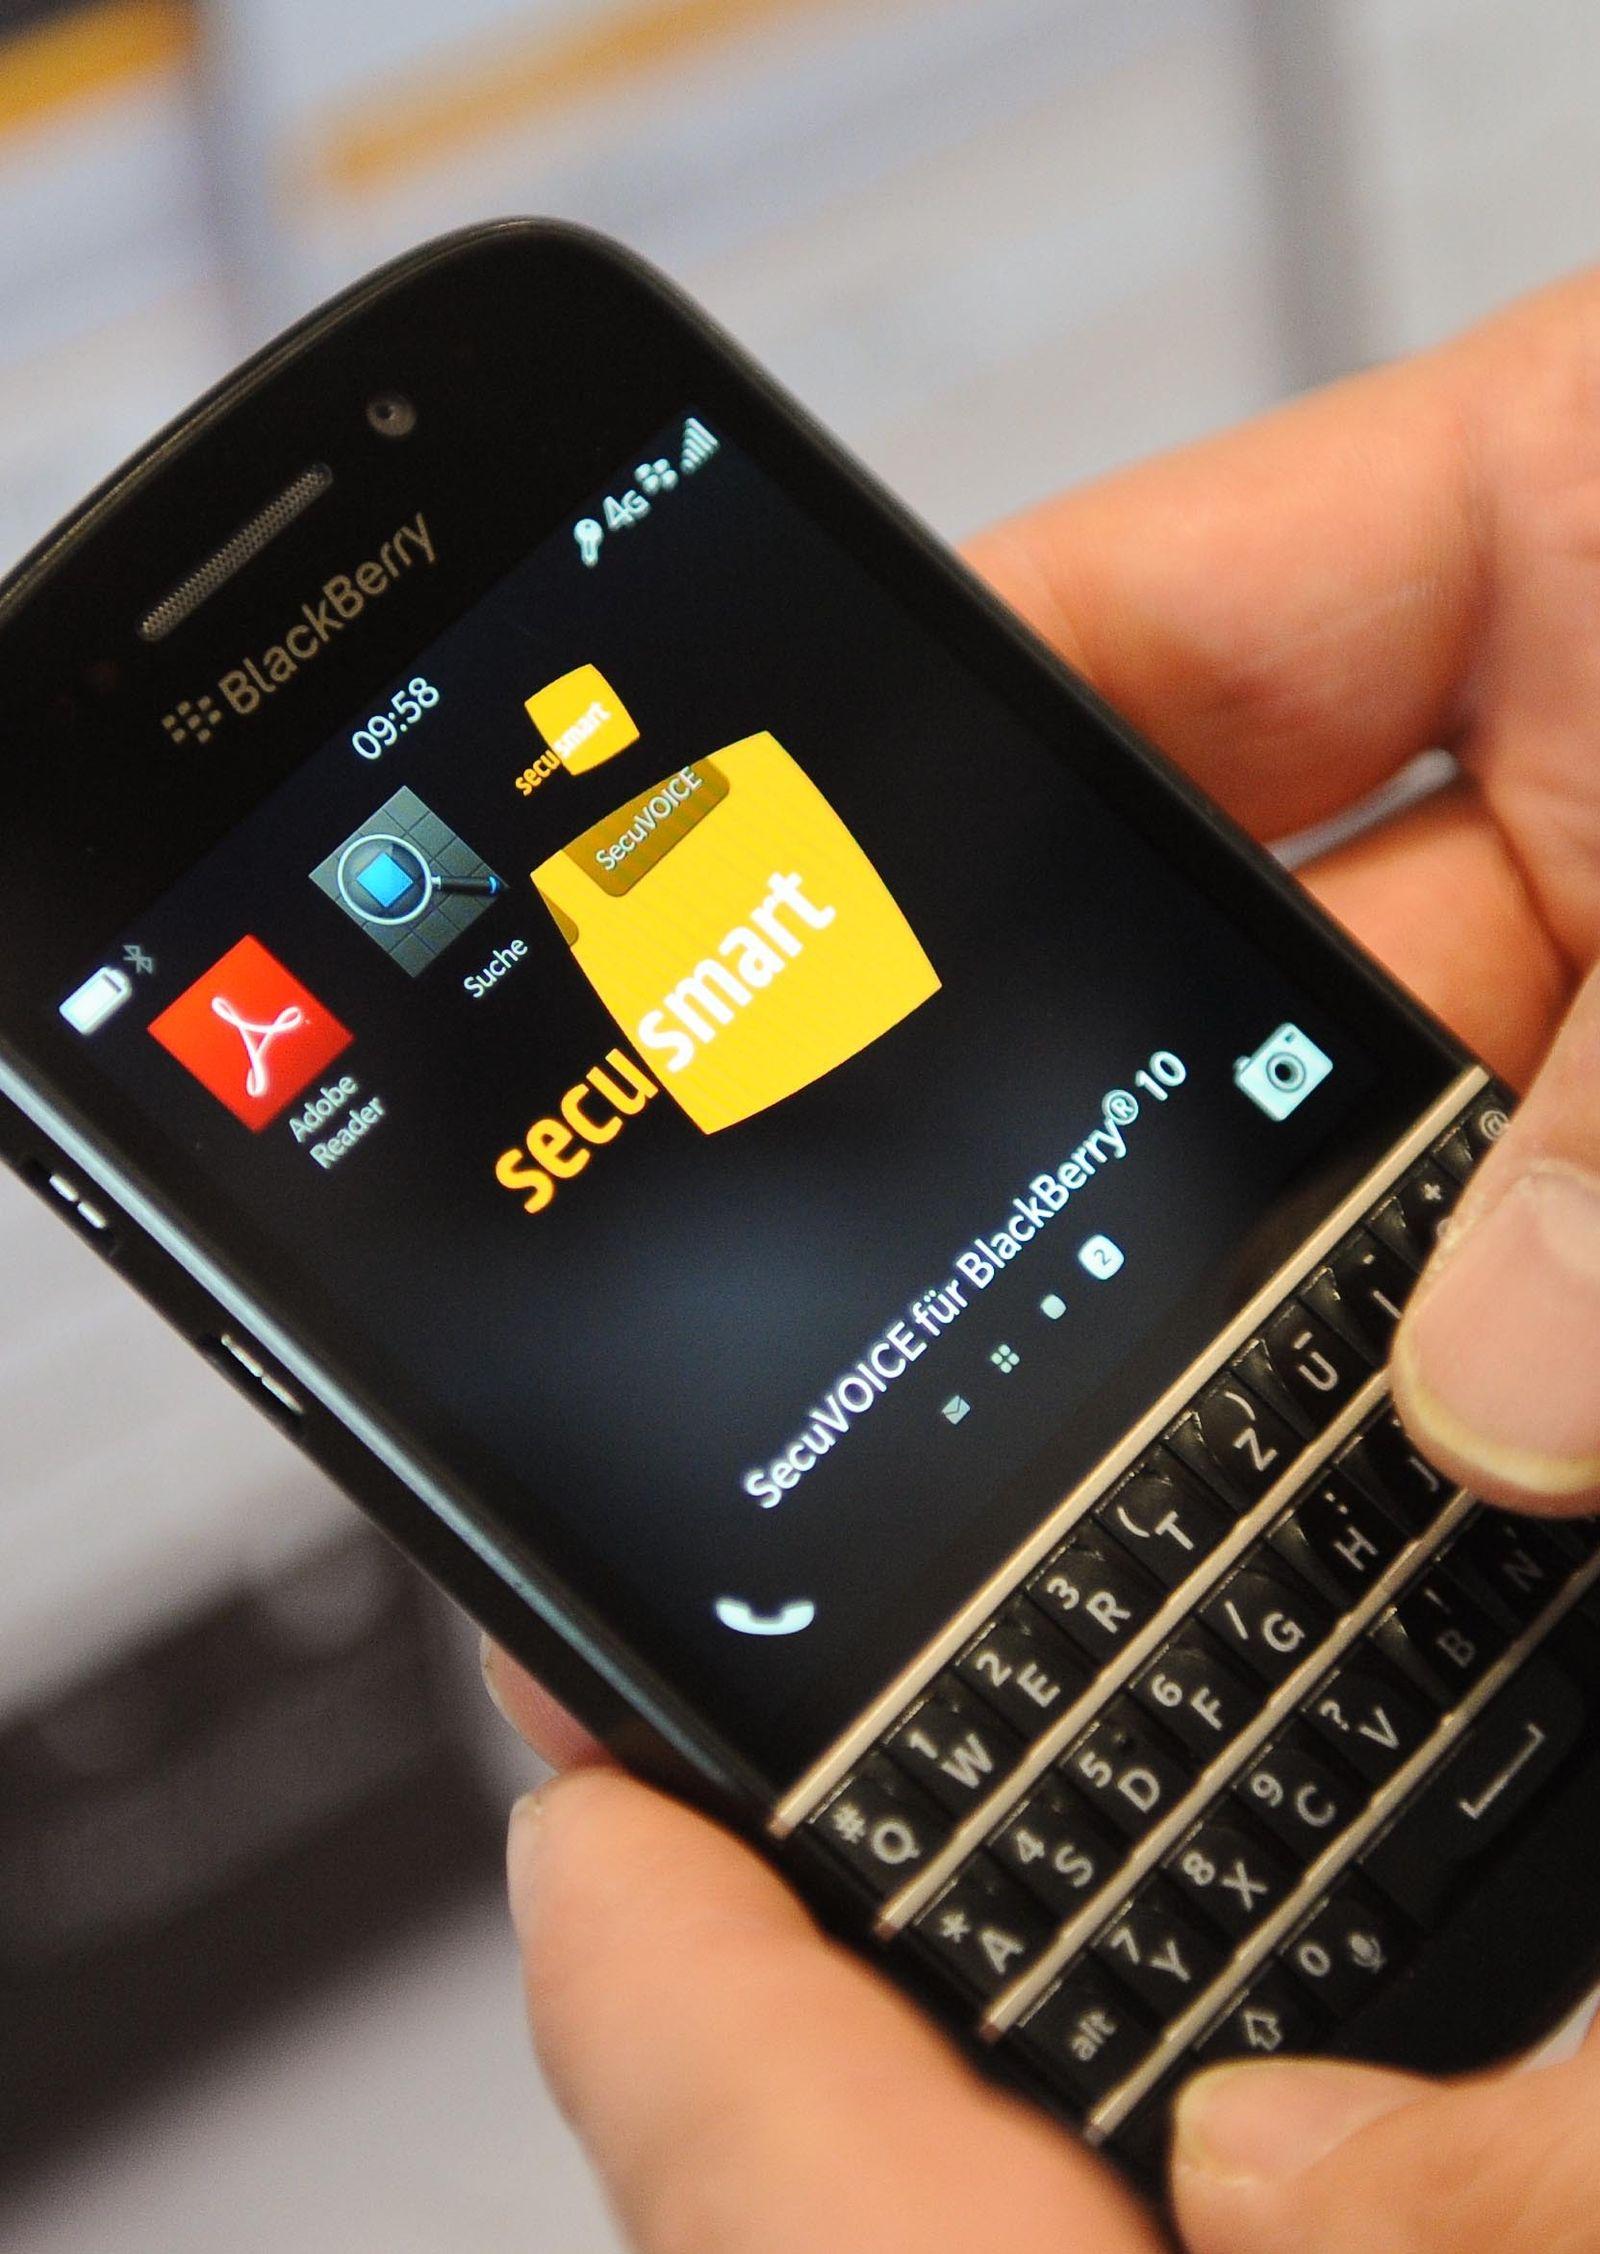 Blackberry übernimmt Secusmart